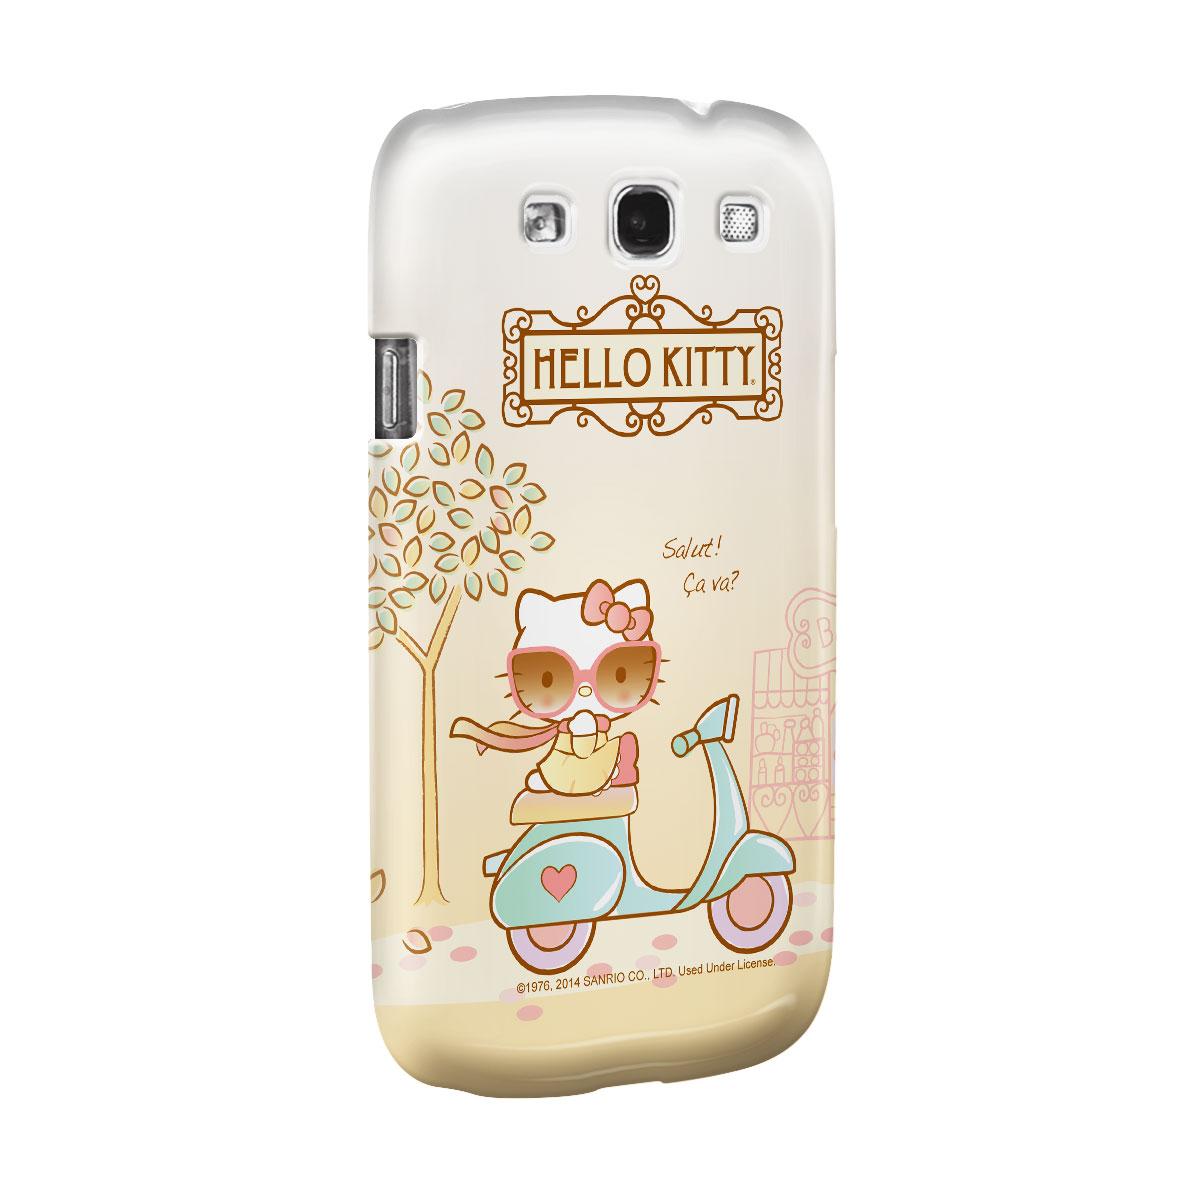 Capa de Celular Samsung S3 Hello Kitty Salut! Ça Va?